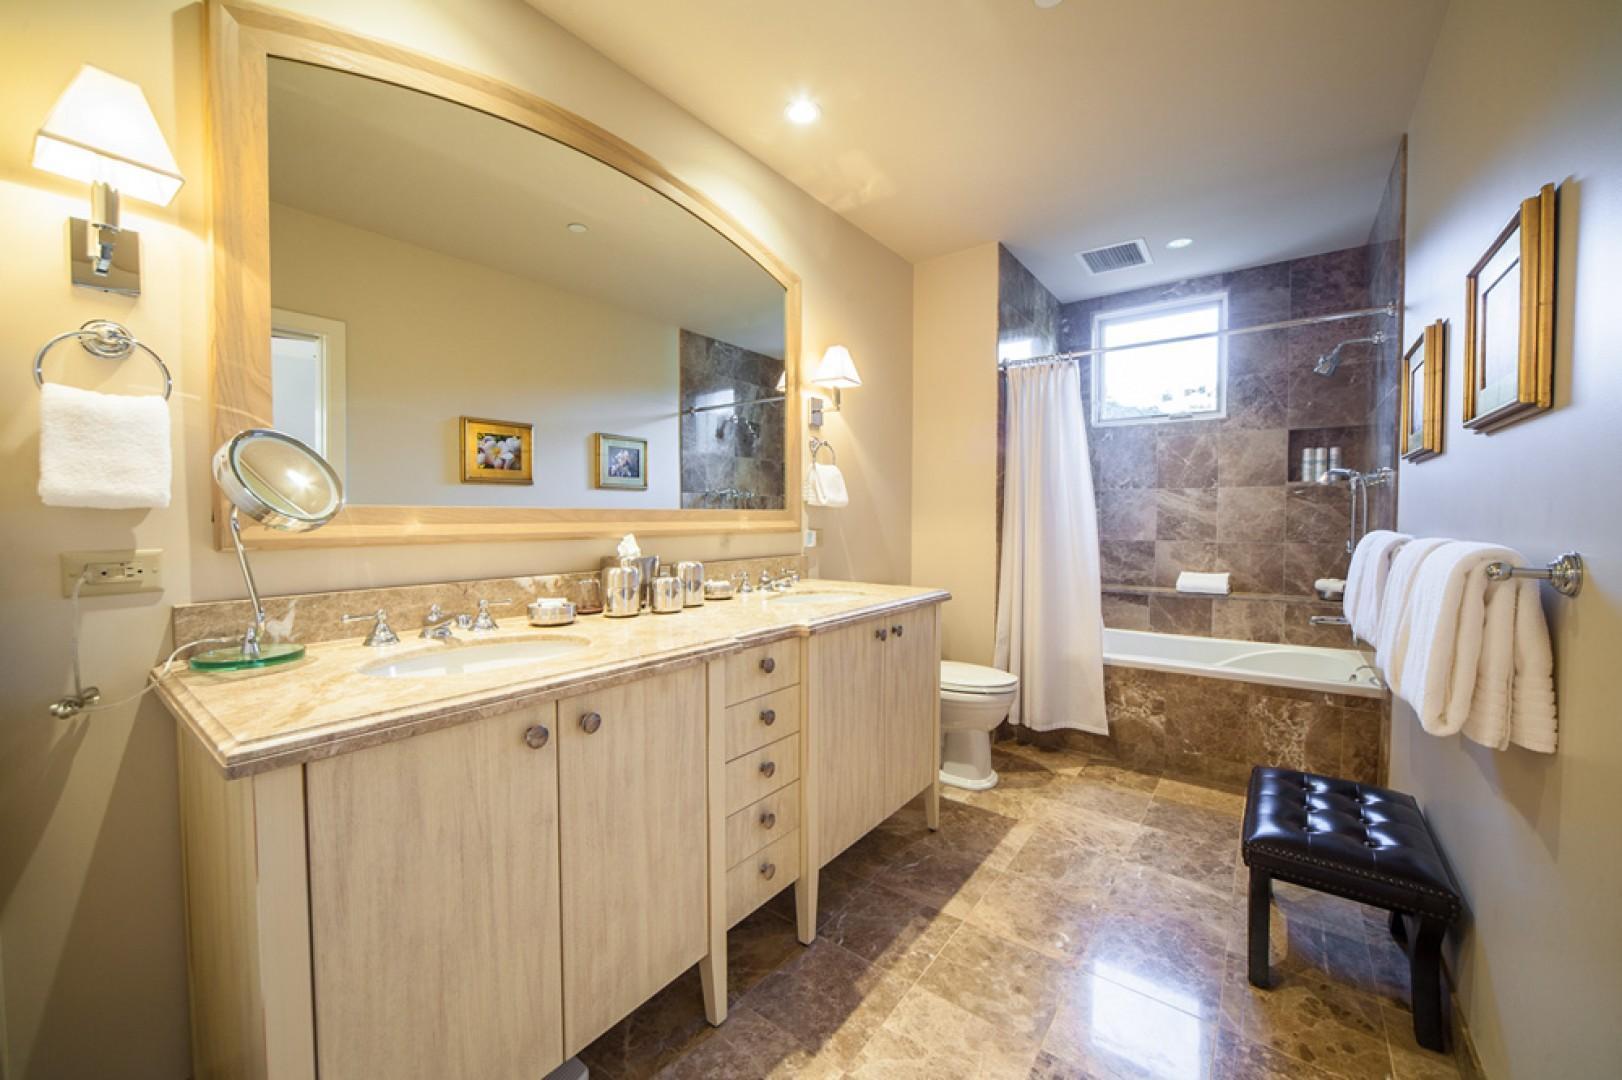 Blue Horizons K308 - Second Bedroom Bath with Twin Vanities, Tu/Shower Bath, Scale, Hair Dryer, Robes